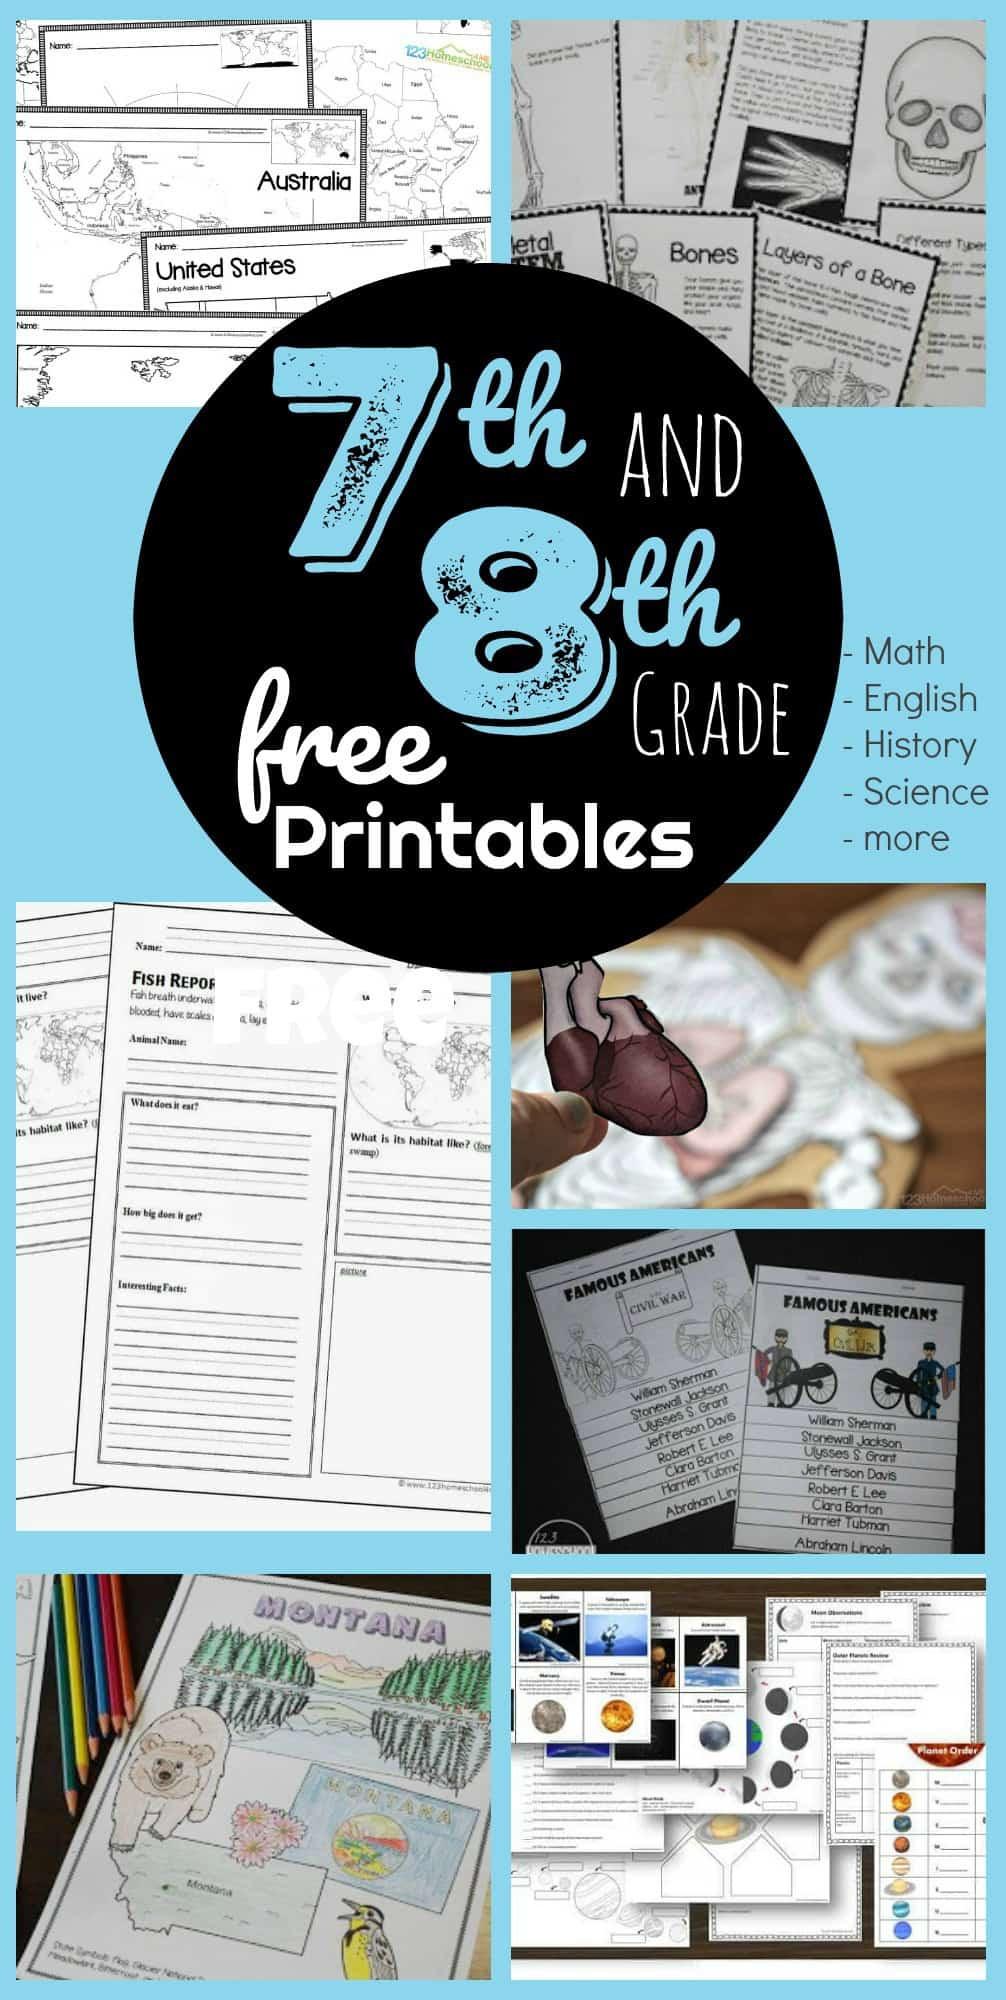 7th Grade Science Worksheets Printable Free 7th & 8th Grade Worksheets